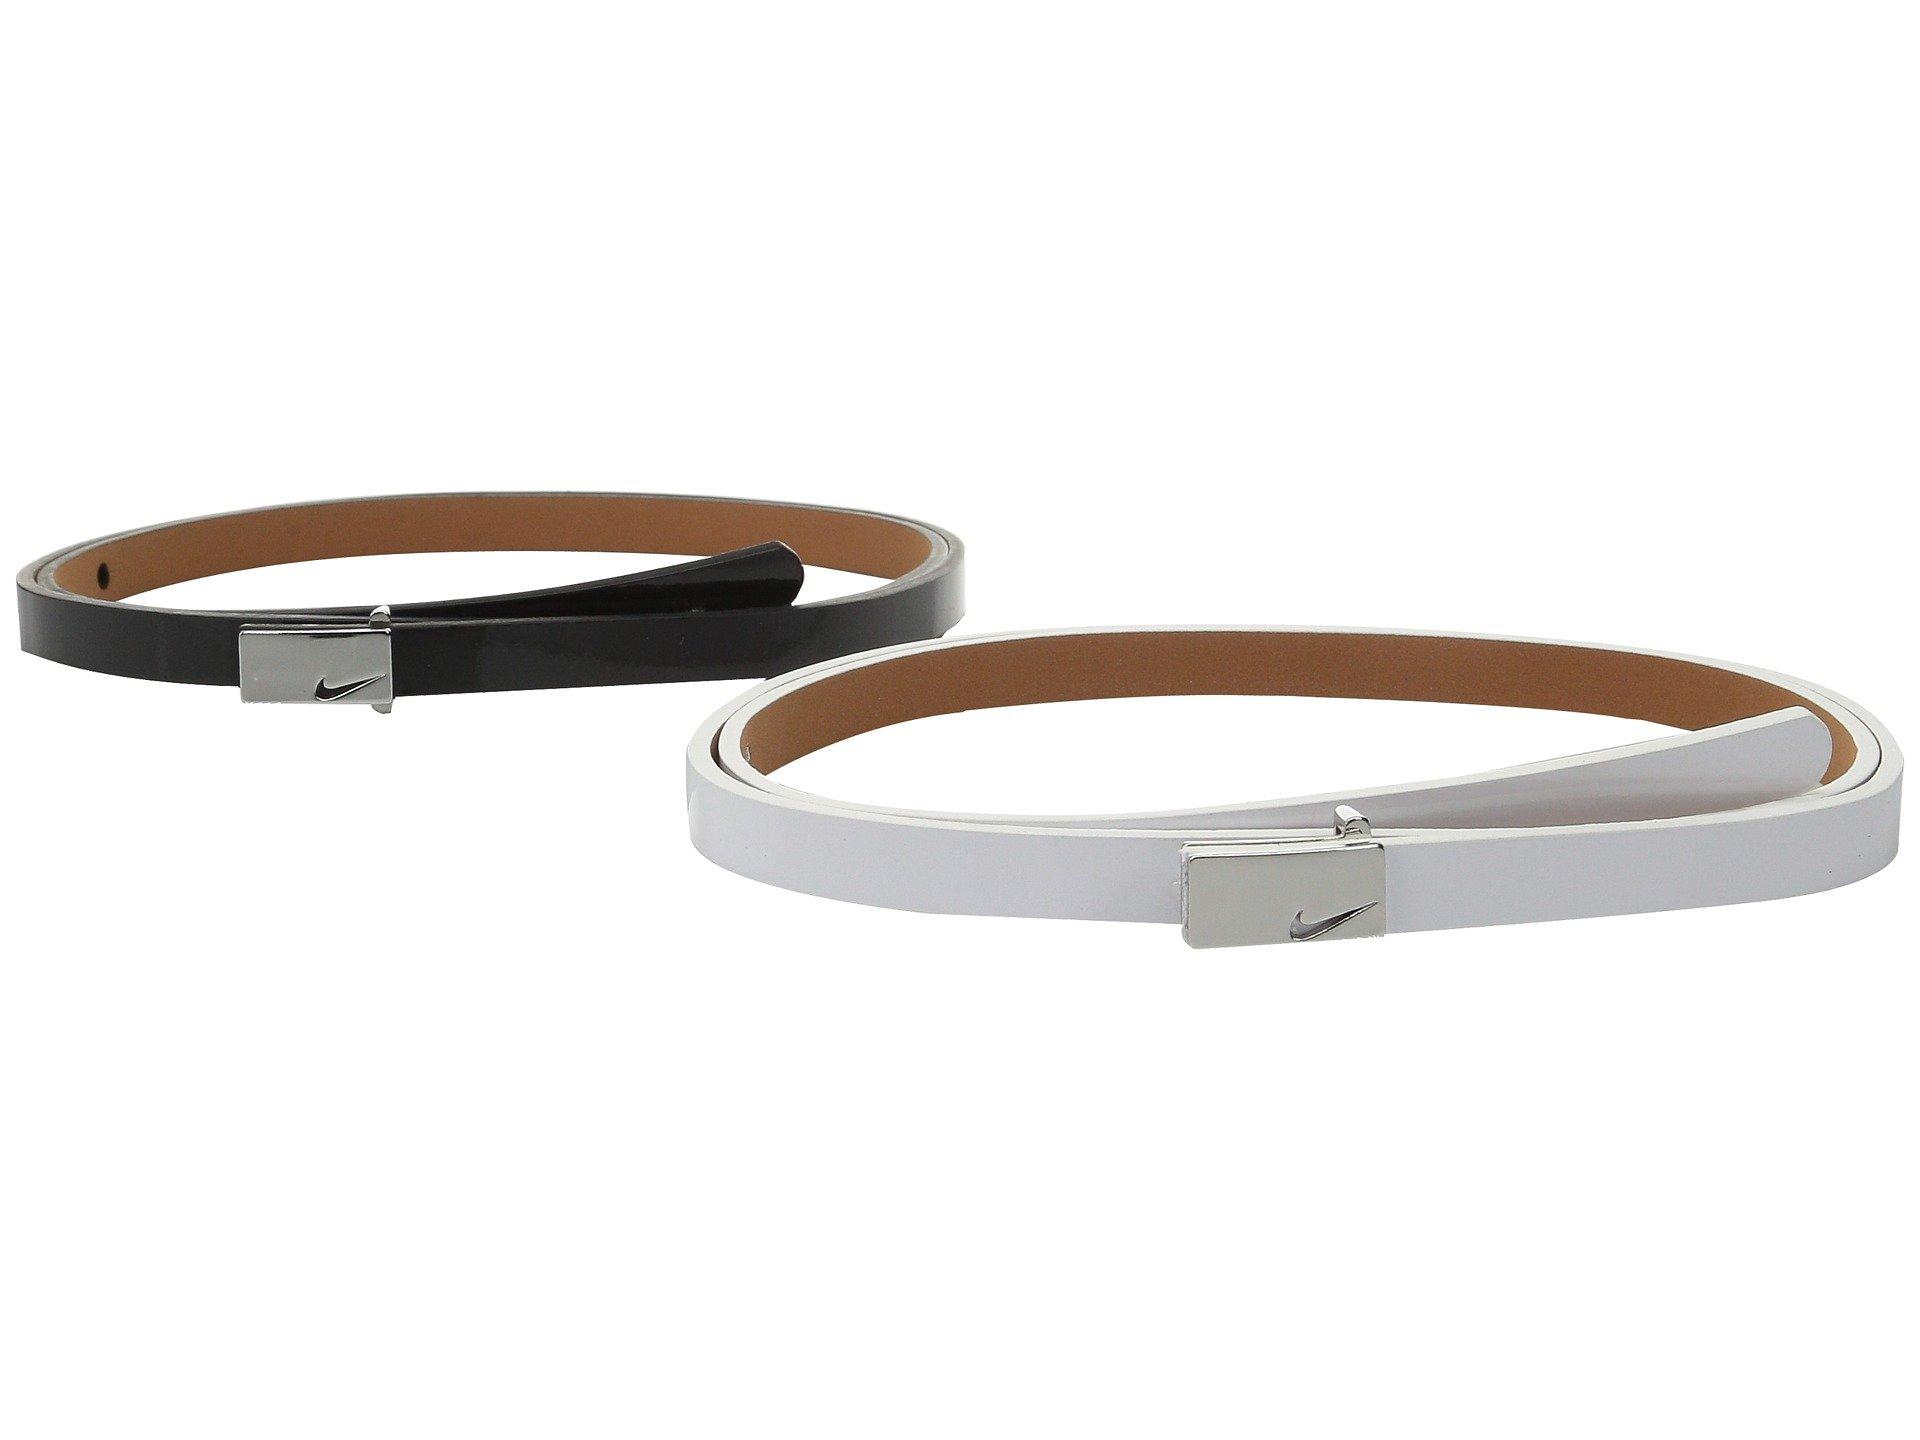 Correa o Cinturon para Mujer Nike Sleek Modern 2 for 1 Skinny  + ike en VeoyCompro.net